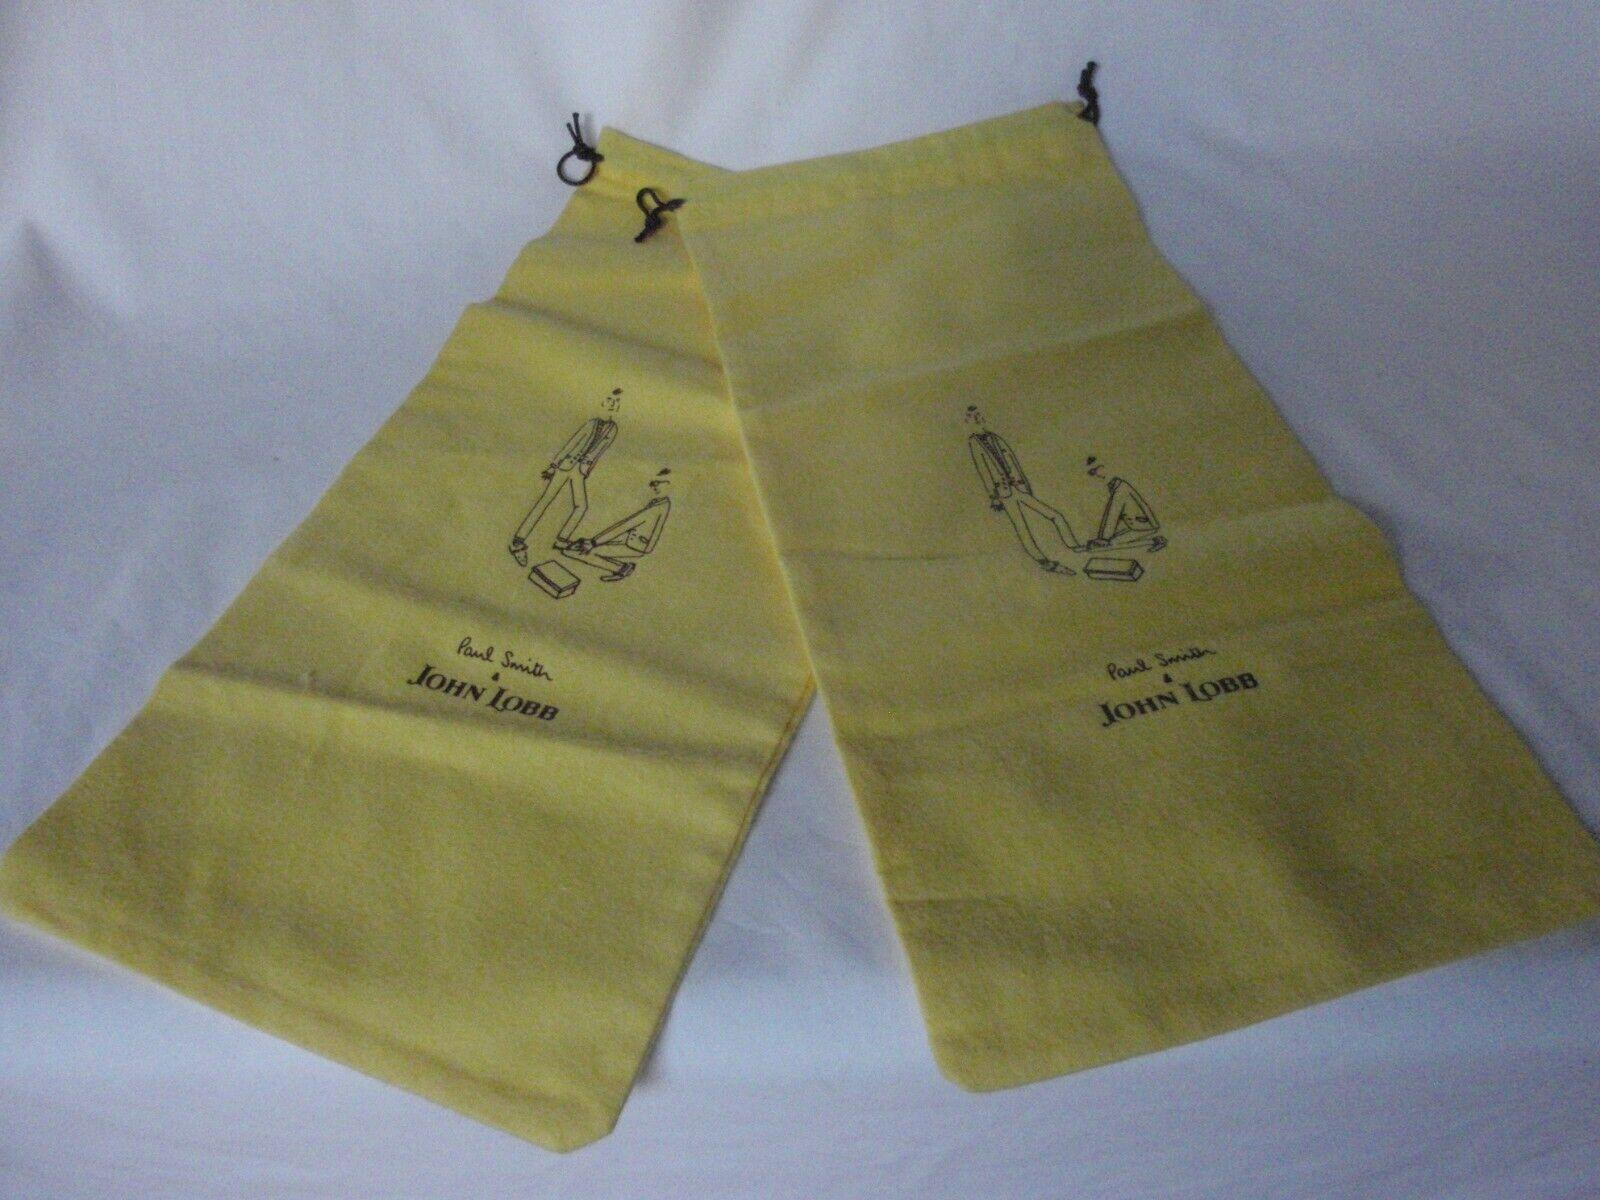 Mens John Lobb for Paul Smith Cotton Shoebags Shoes Dustbags Sleeper Bags 1 pair